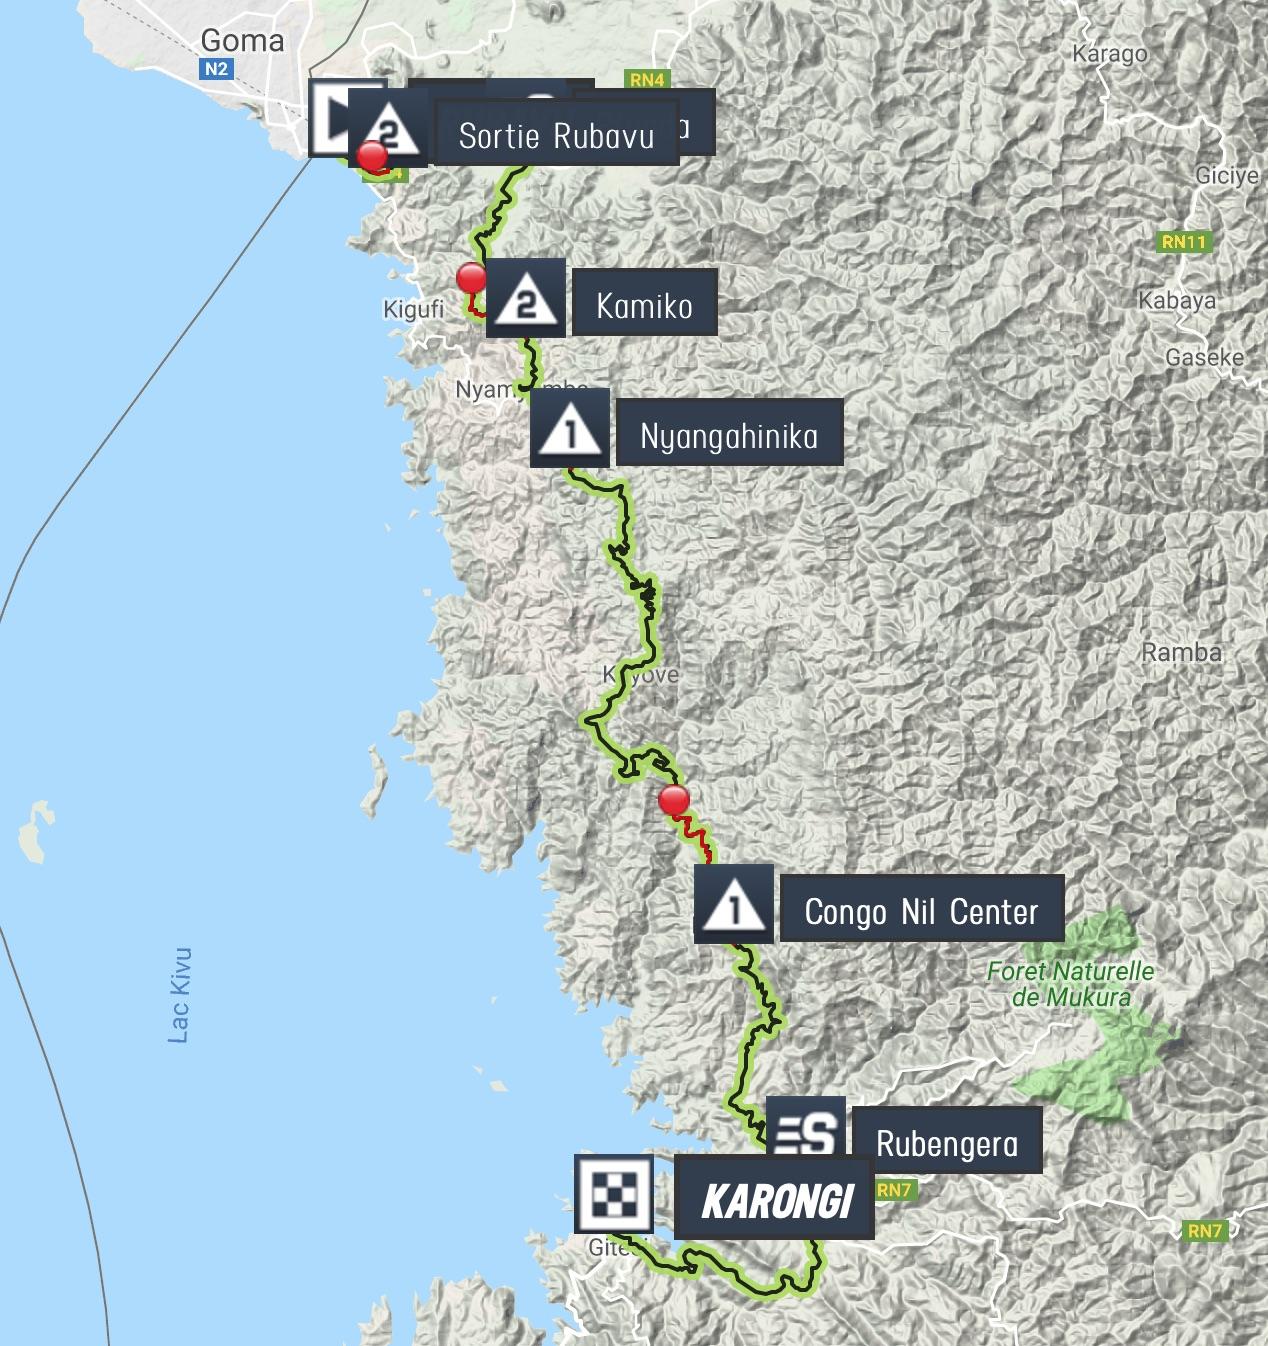 https://www.procyclingstats.com/images/profiles/ap/ec/tour-of-rwanda-2019-stage-4-map-c27a4488c0.jpg